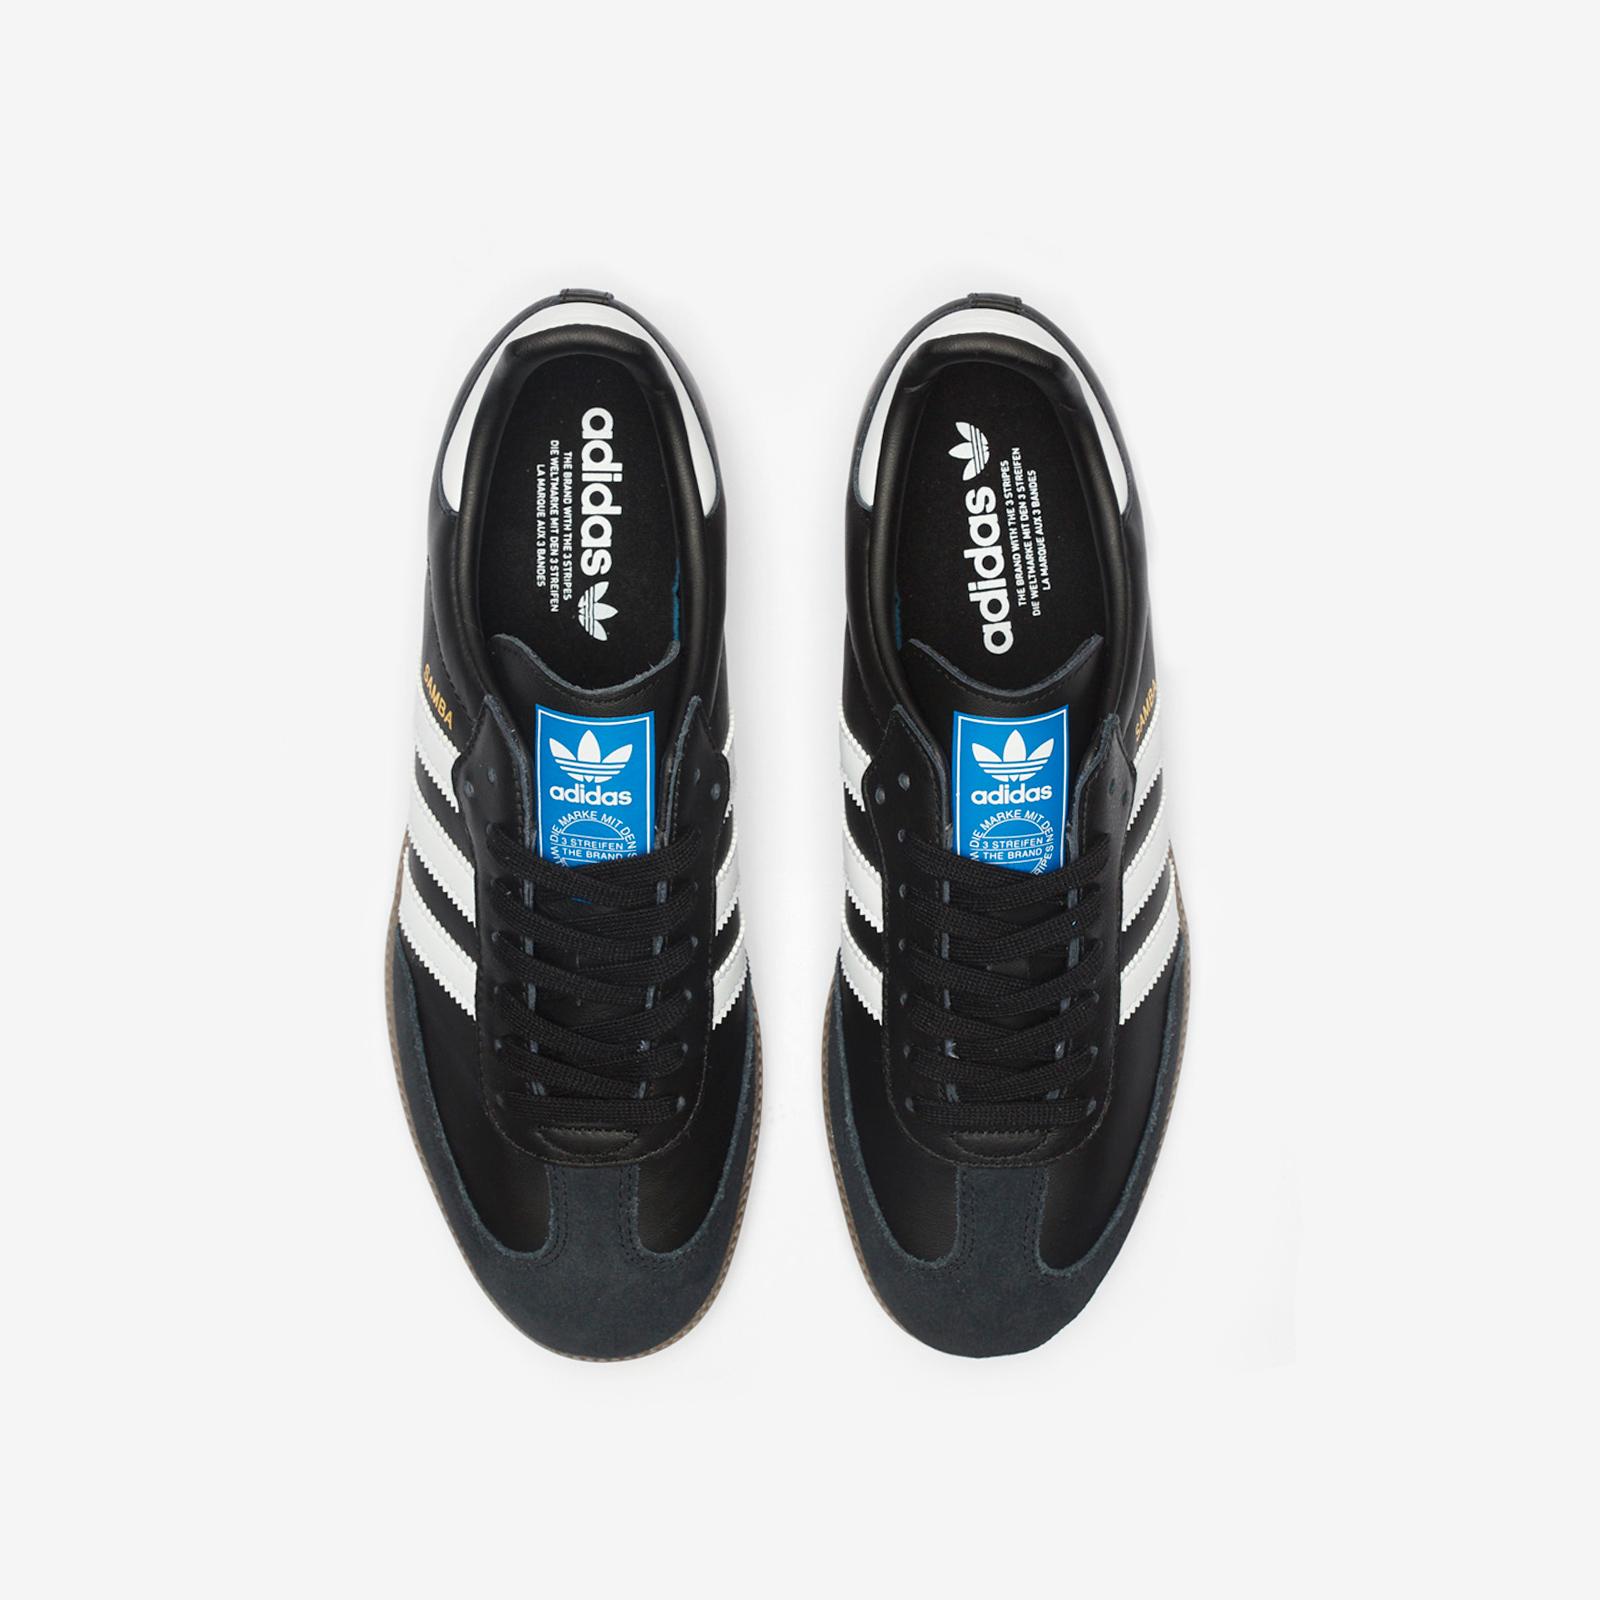 adidas Samba OG B75807 Sneakersnstuff I Sneakers